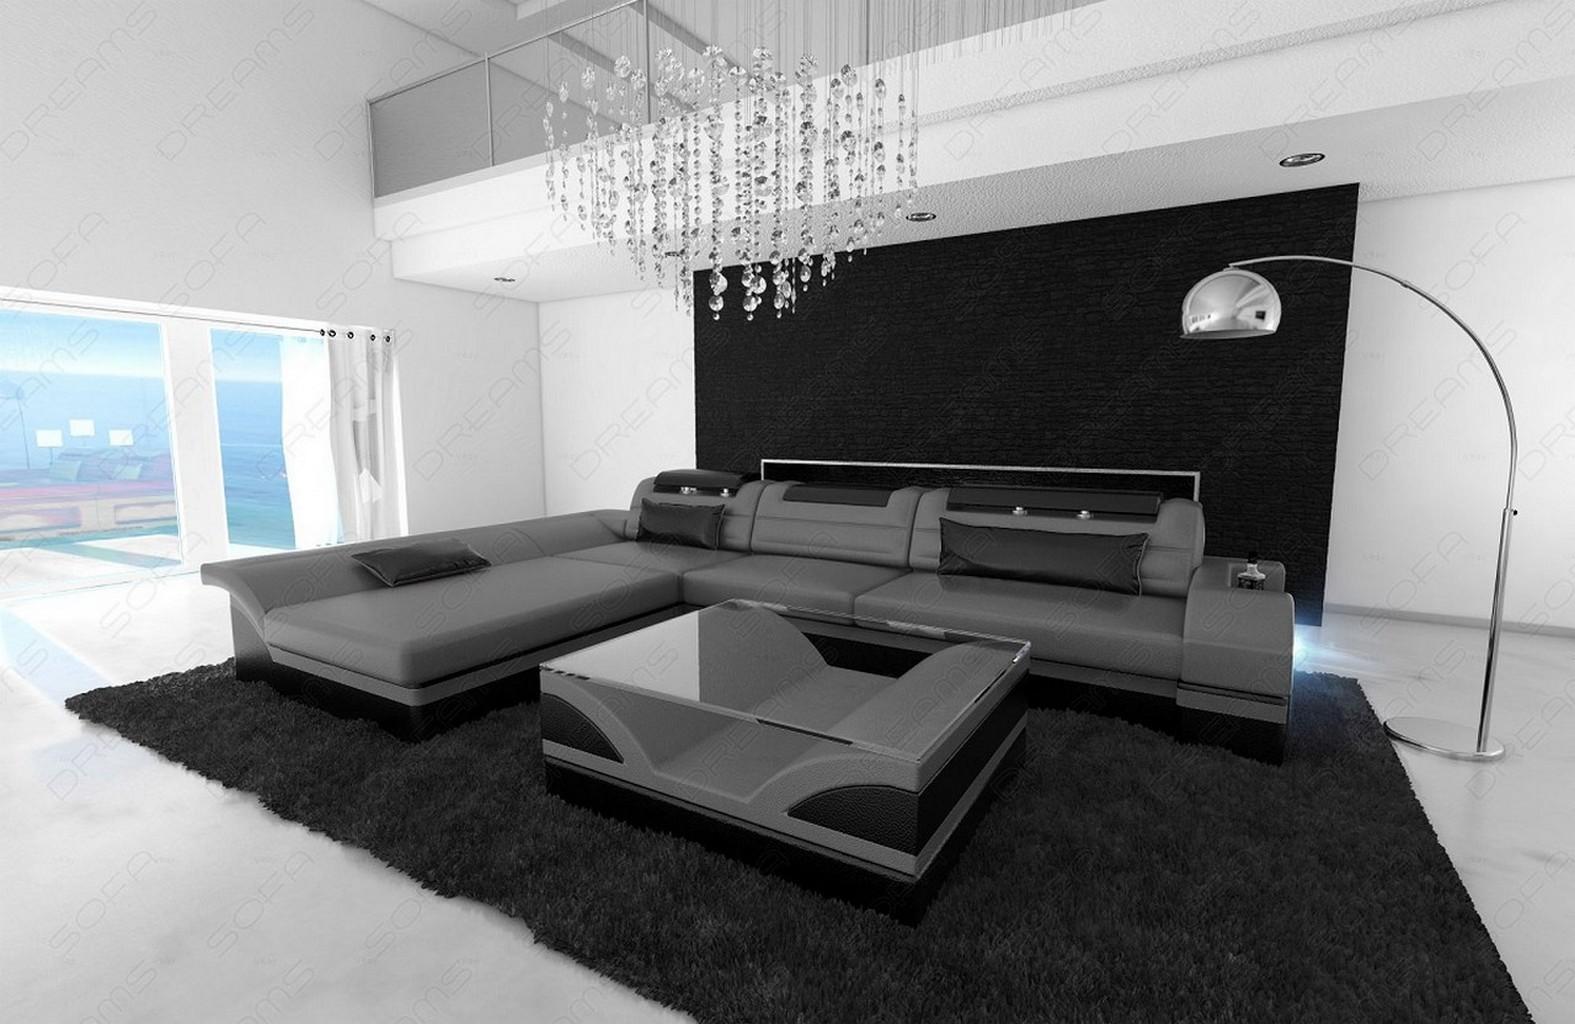 Designersofa ecksofa monza l form luxus couch grau schwarz - Sofa l form grau ...